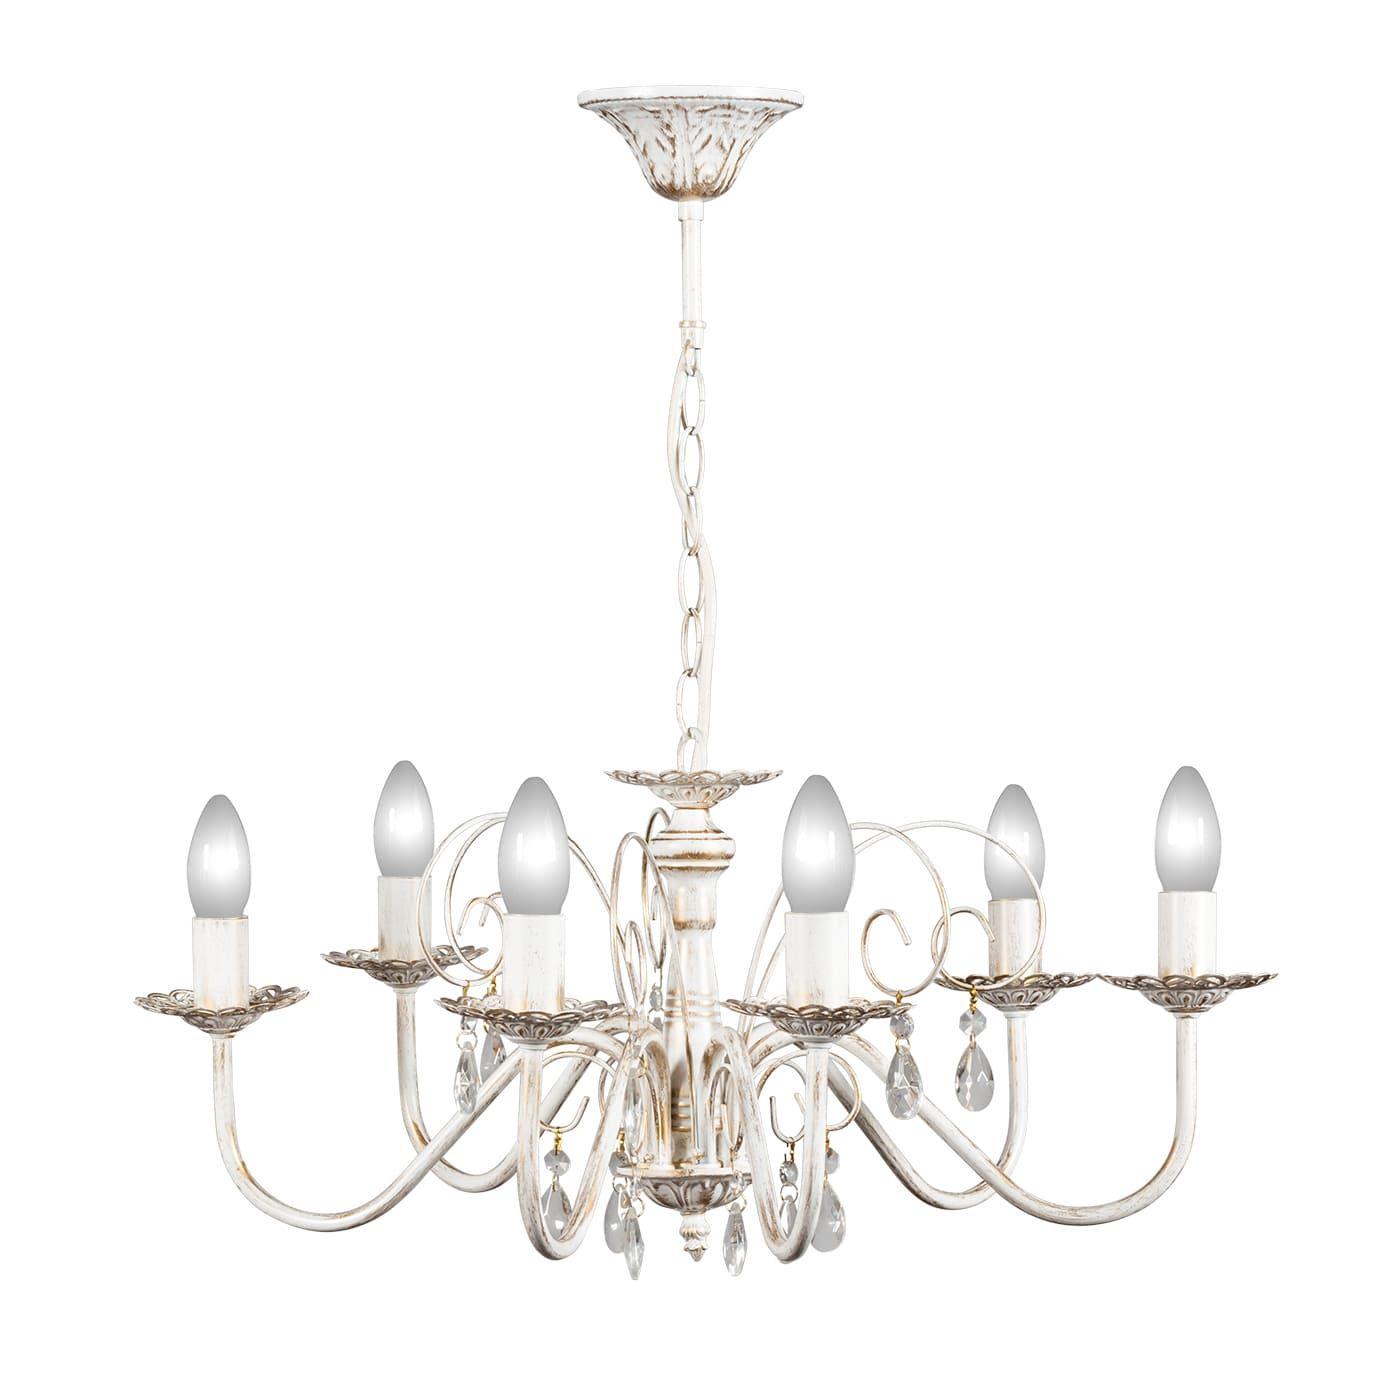 PETRASVET / Pendant chandelier S1018-6, 6xE14 max. 60W